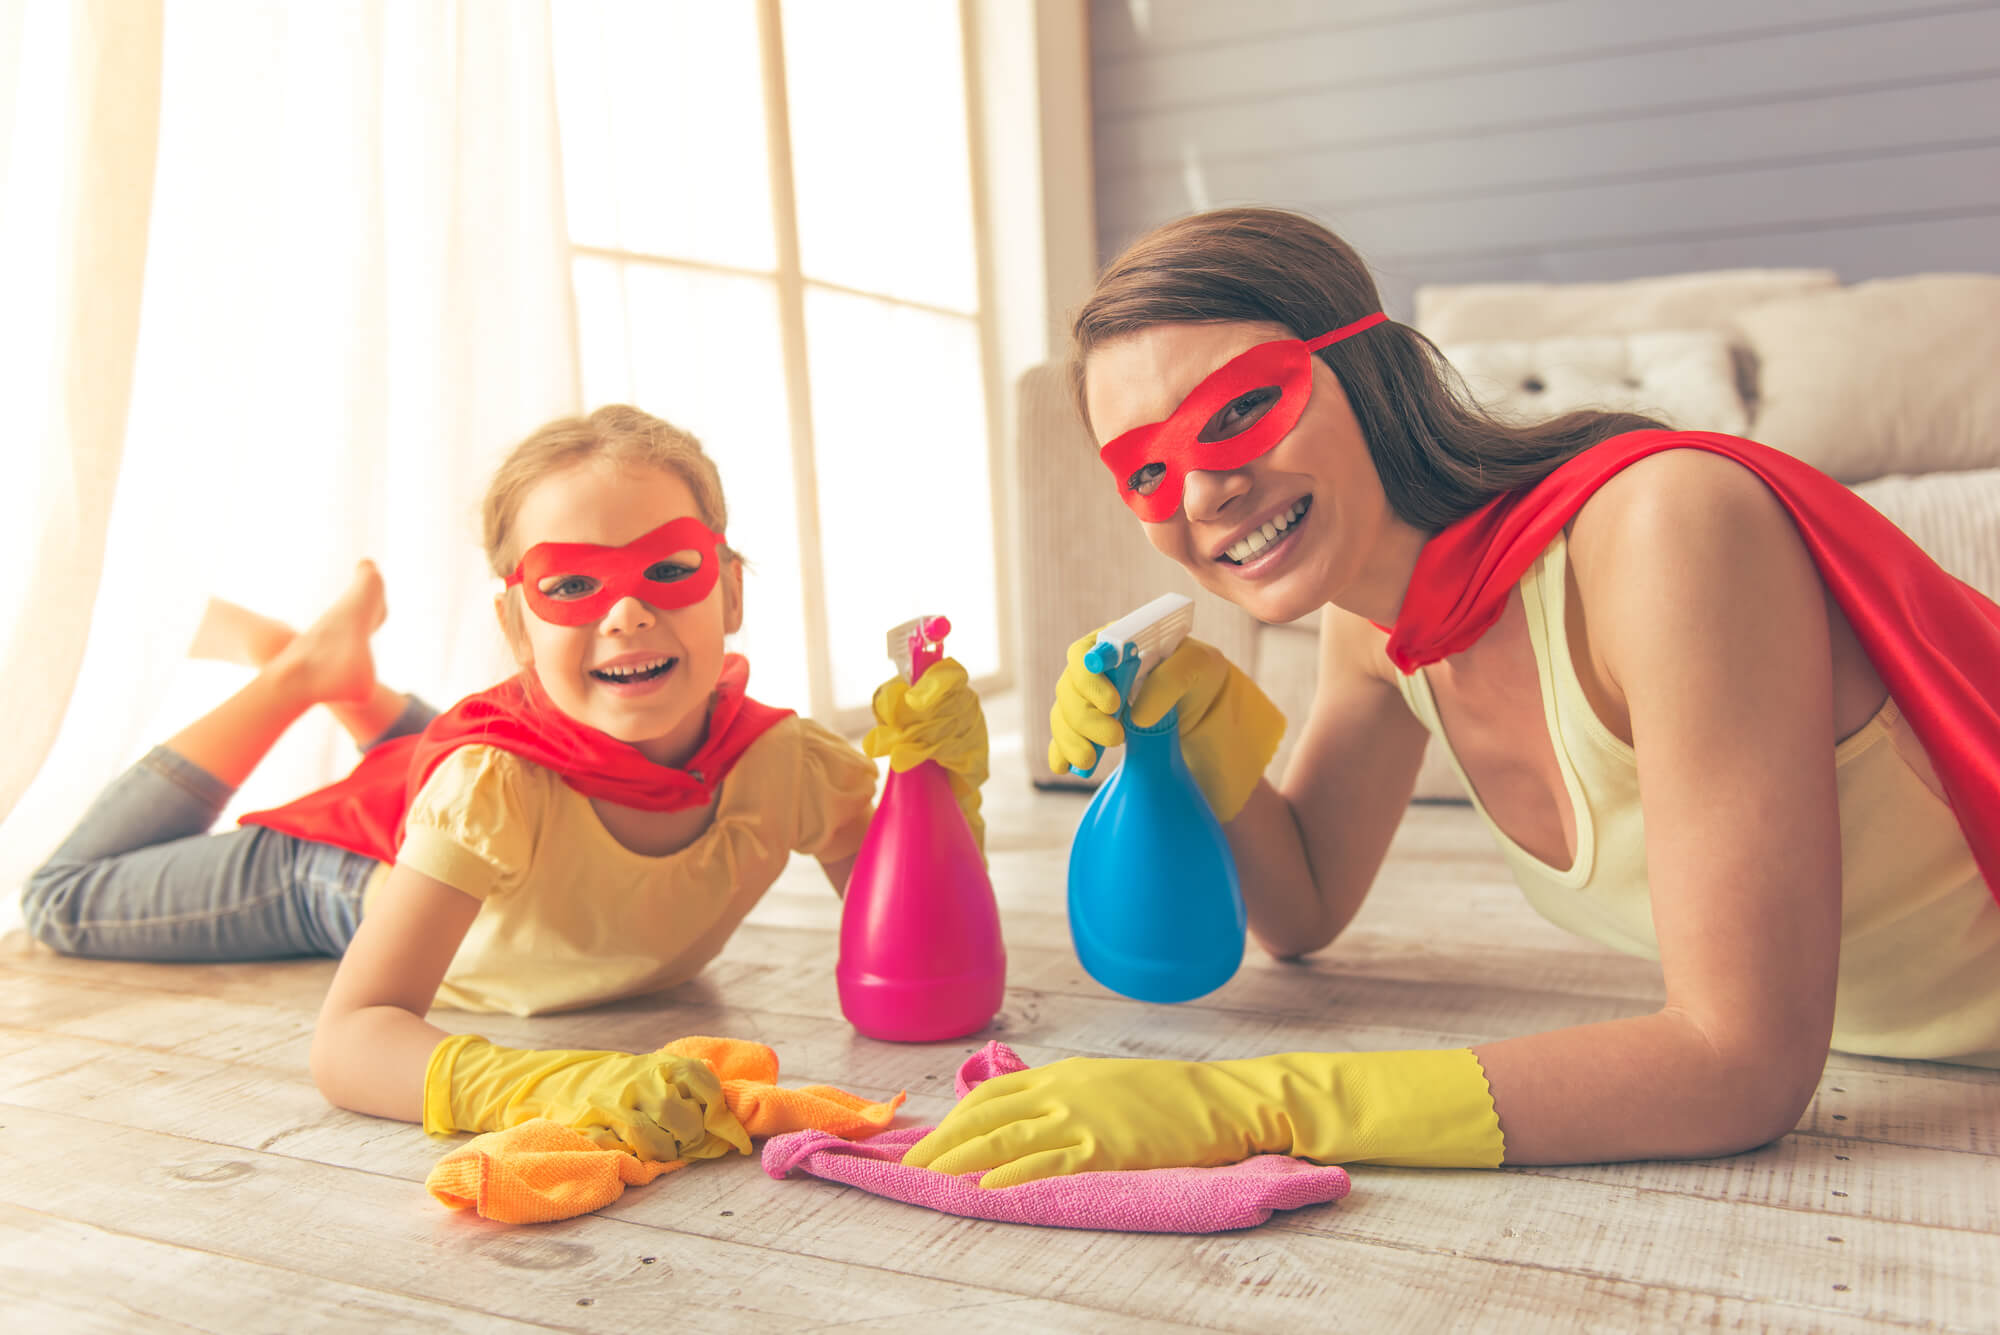 128233-tarefas-domesticas-para-criancas-entenda-a-importancia